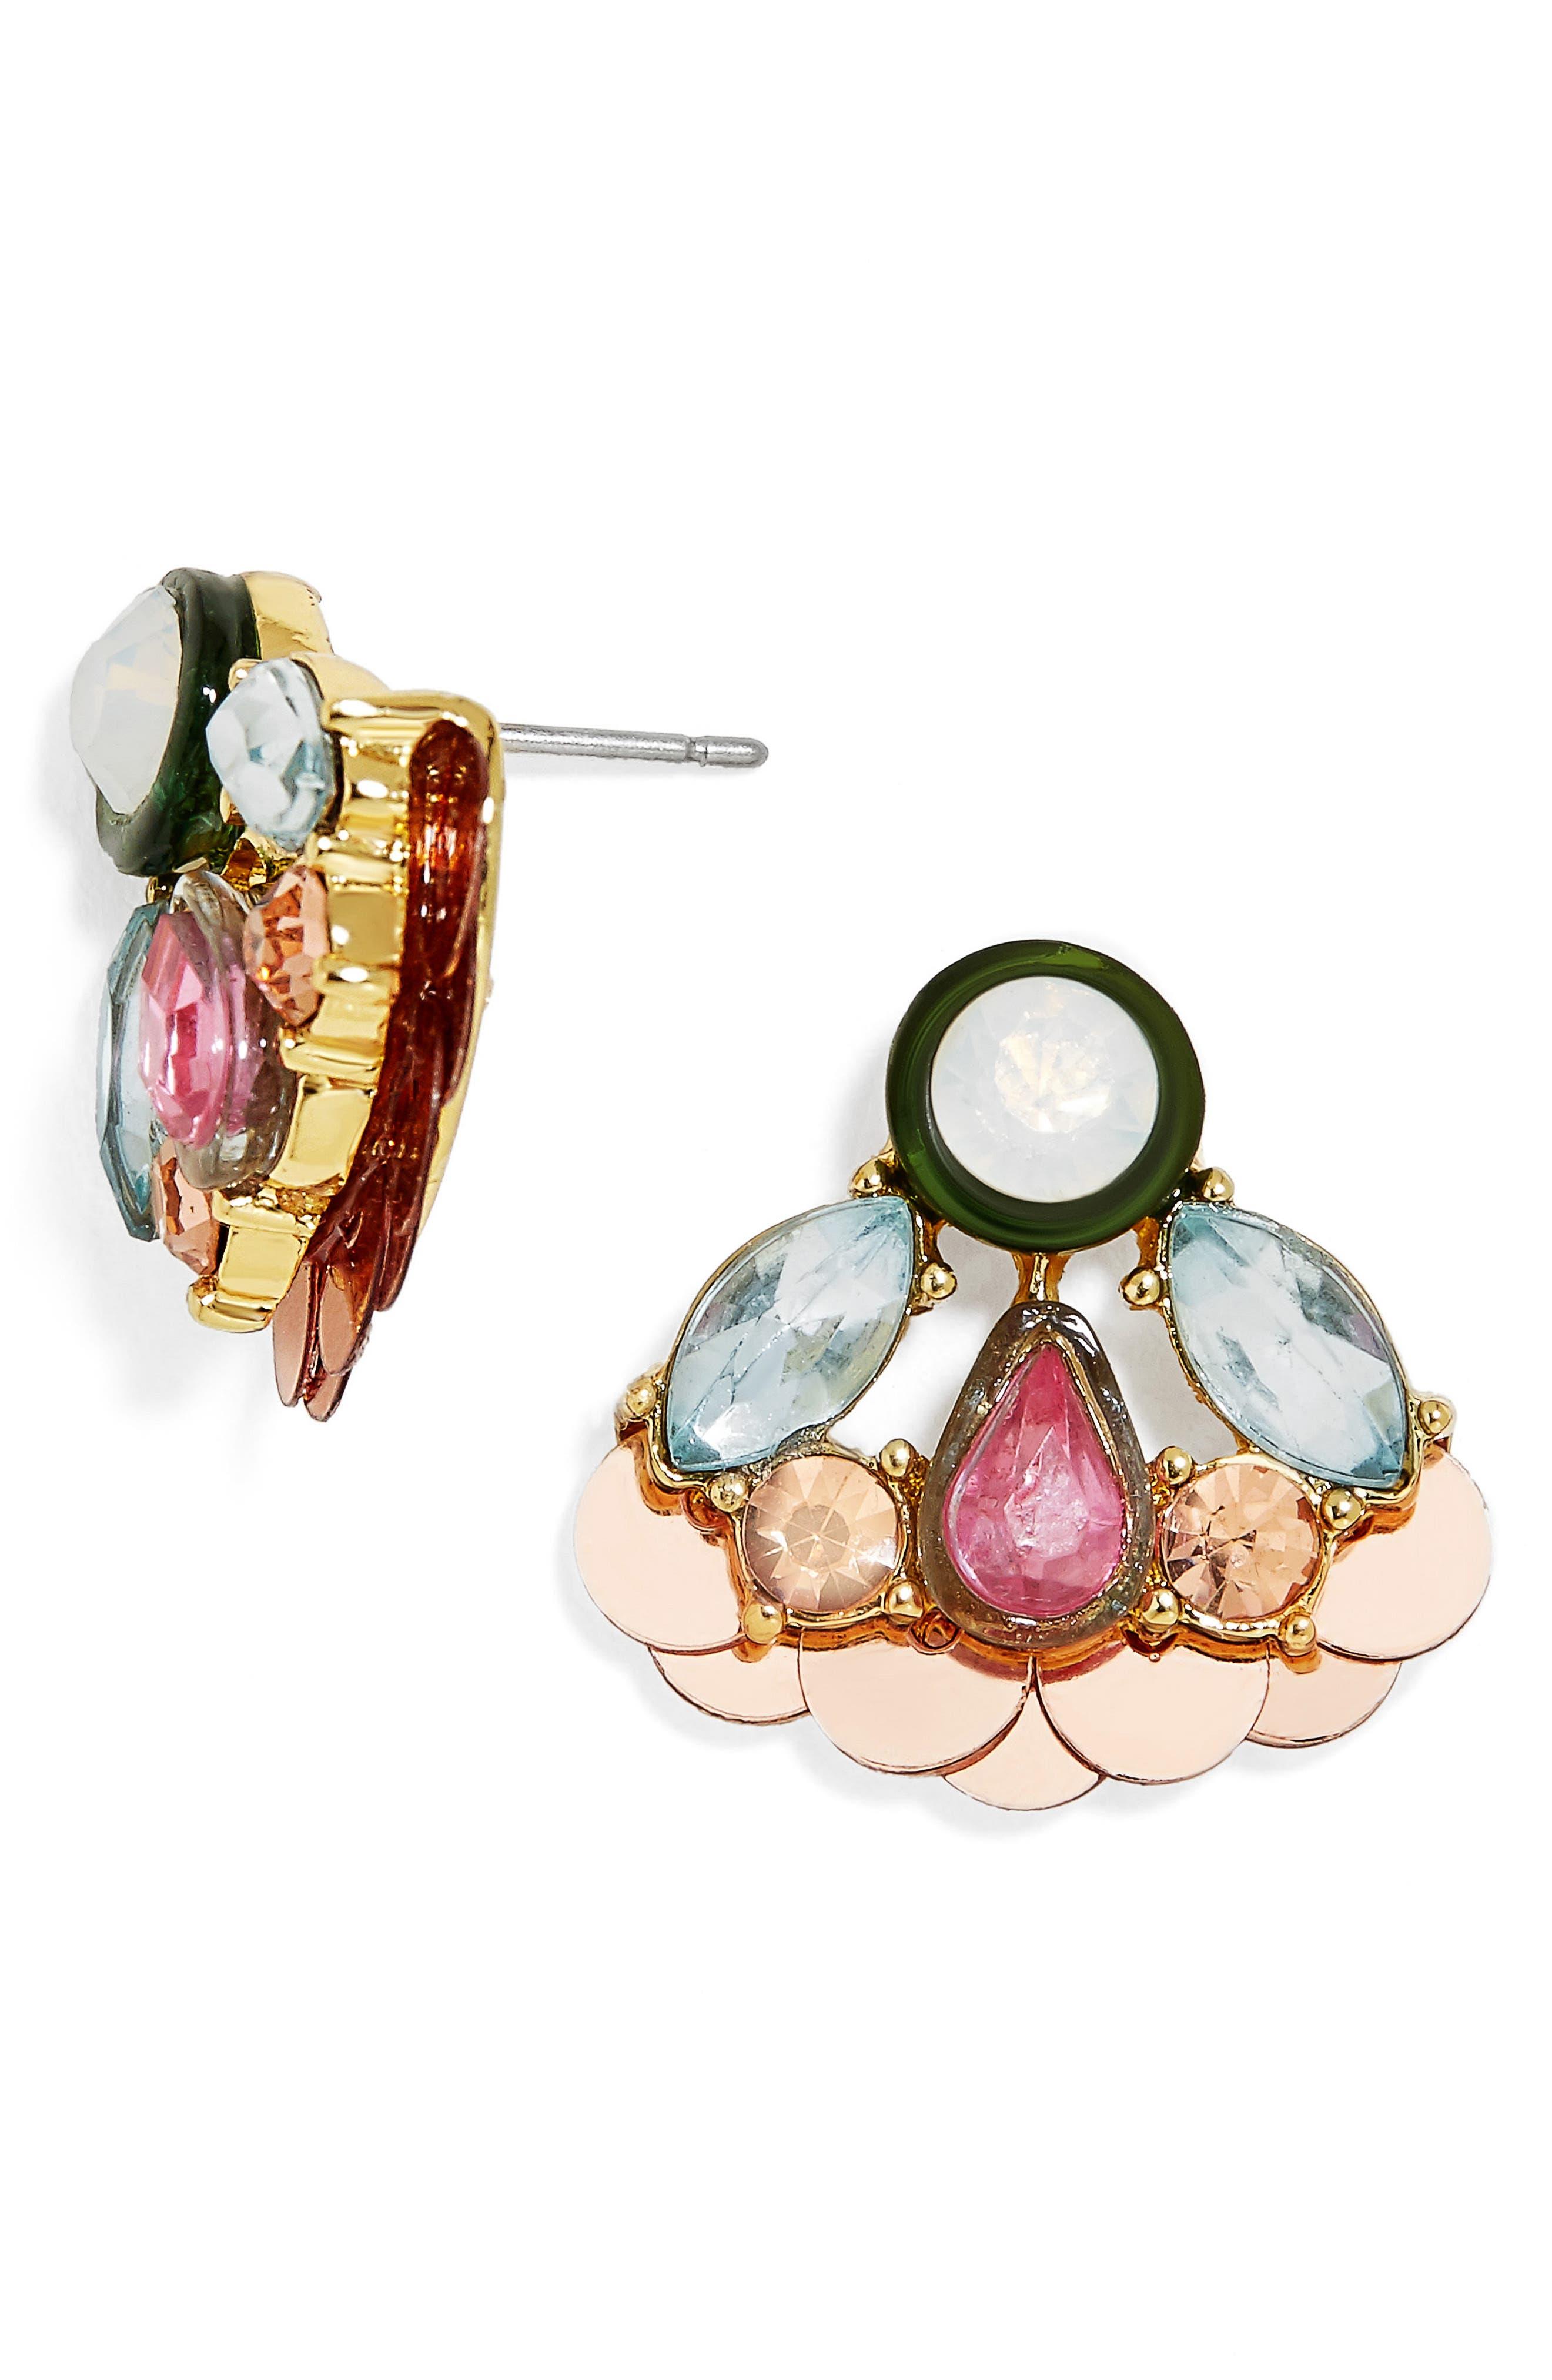 Angeli Stud Earrings,                             Main thumbnail 1, color,                             Multi/ Pink